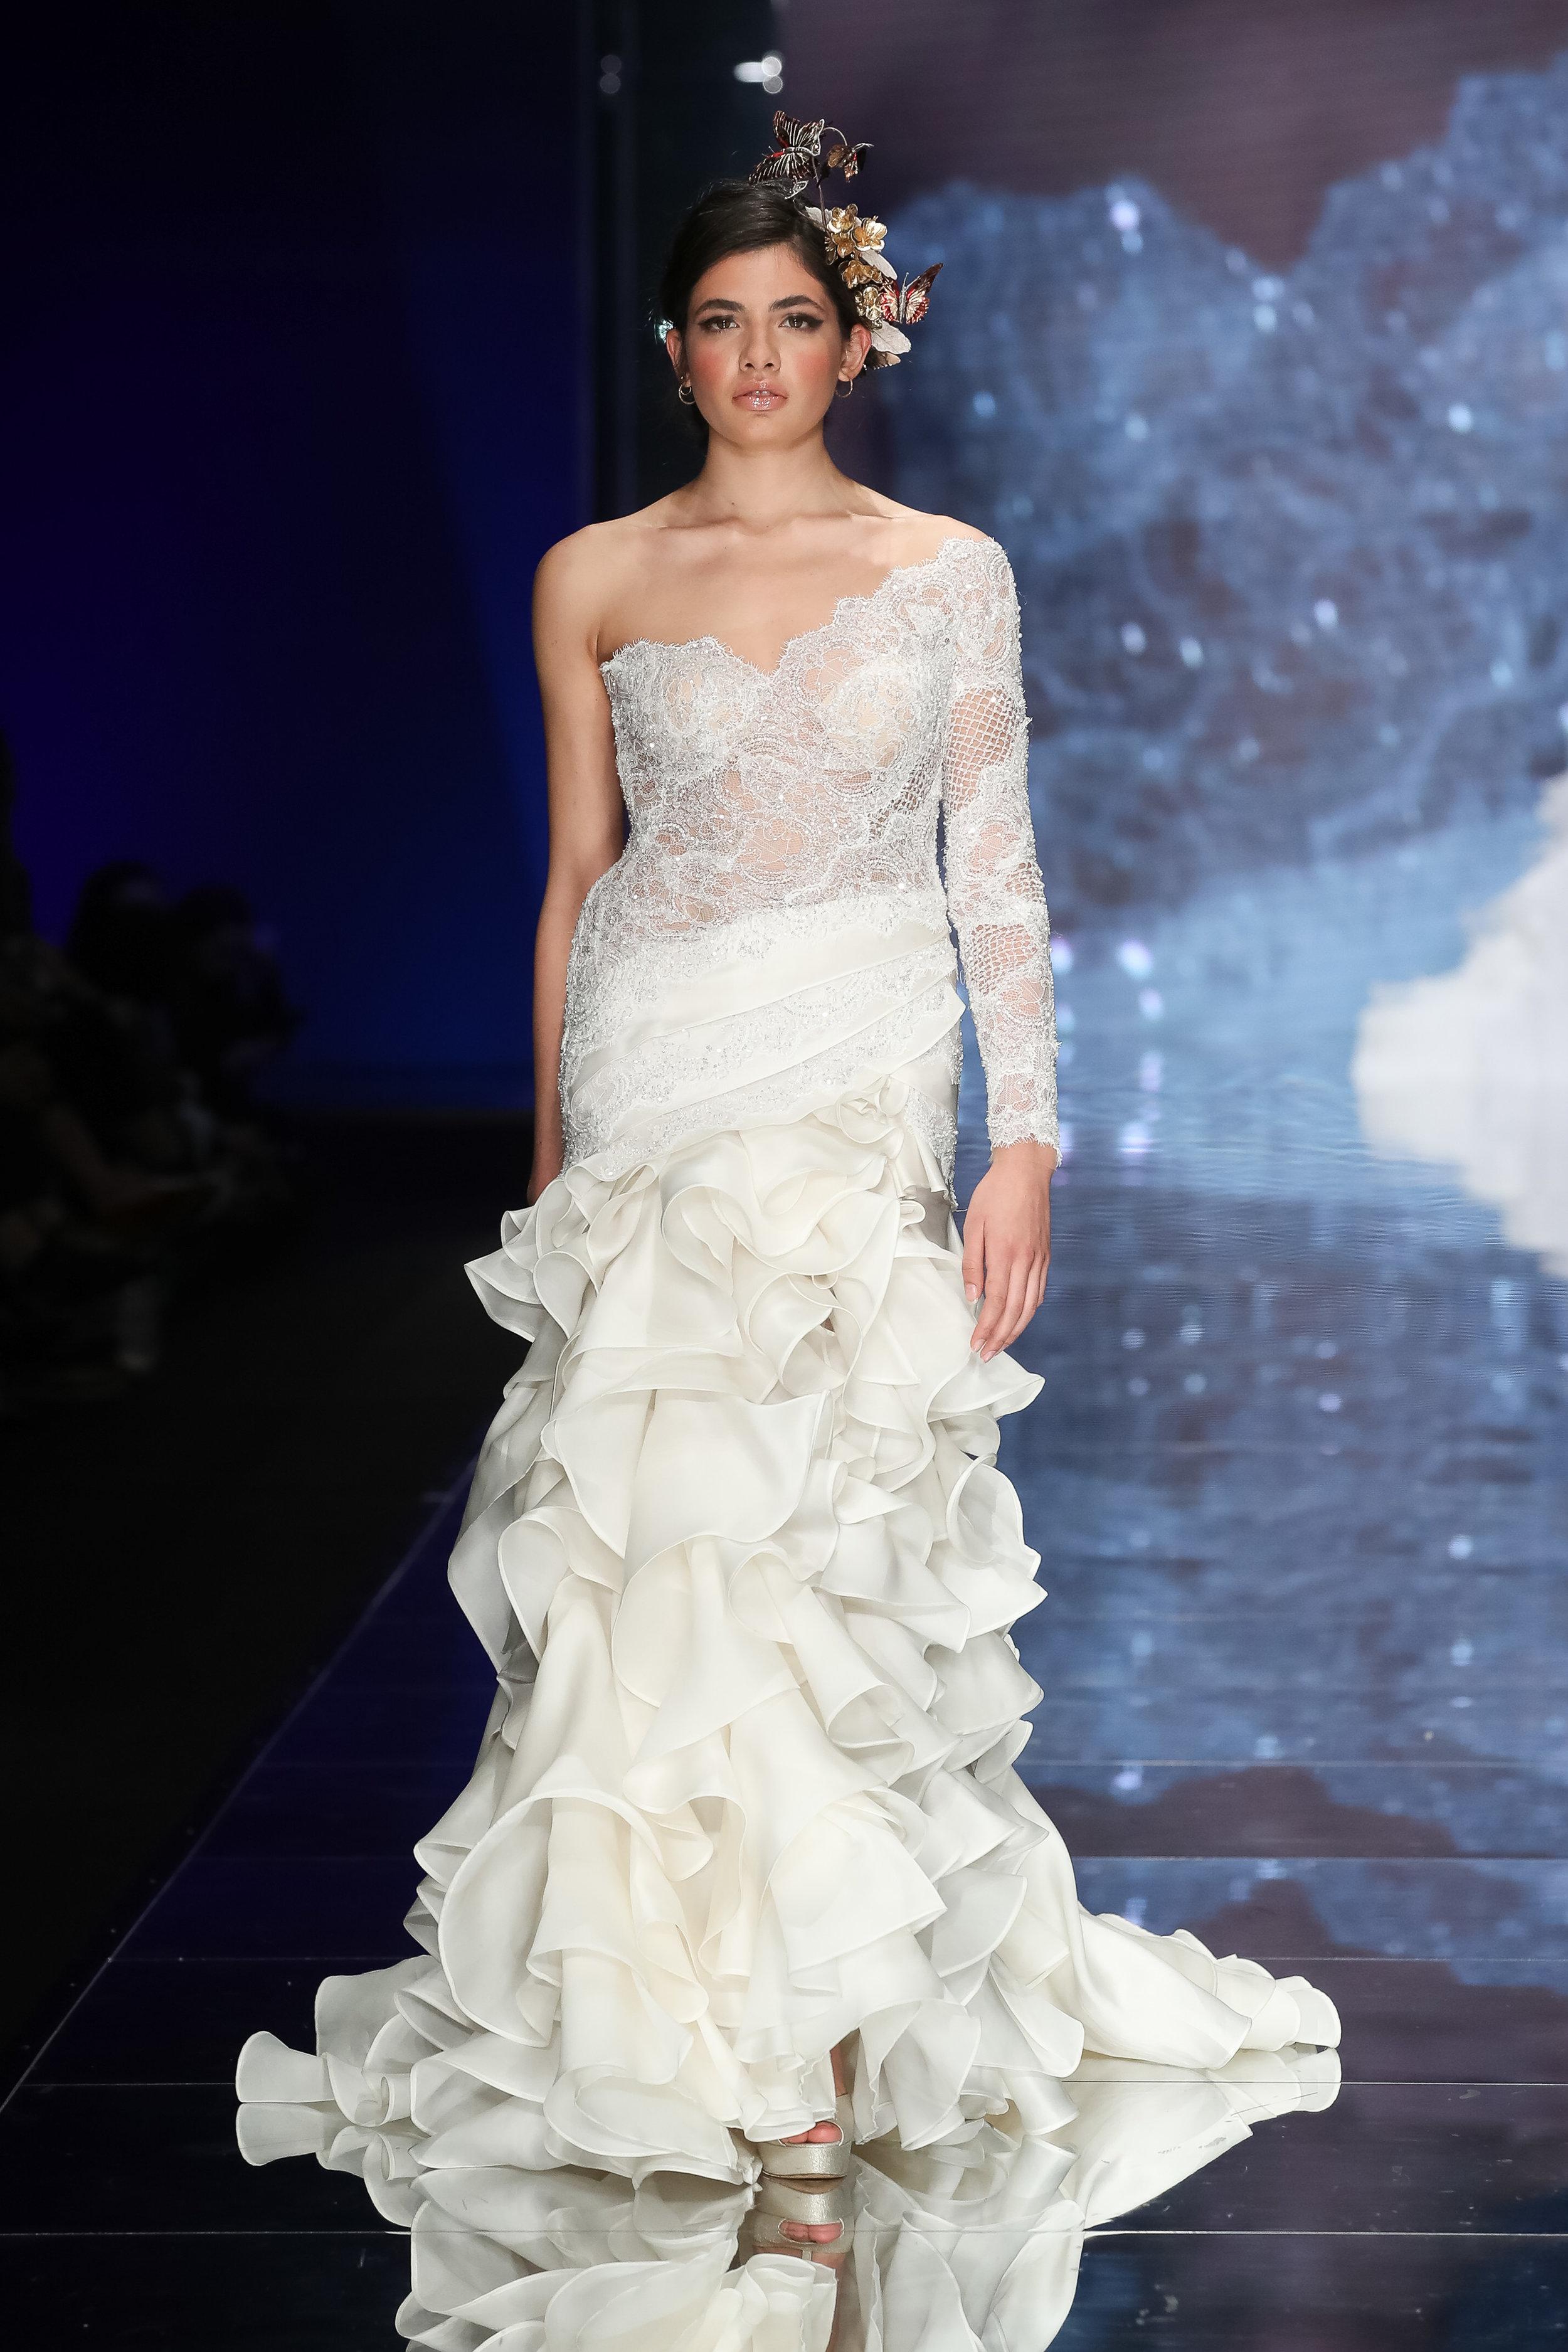 Designer: Emiliano Bengasi - Pasarela   Sì Sposaitalia Collezioni    Milano Bridal Week